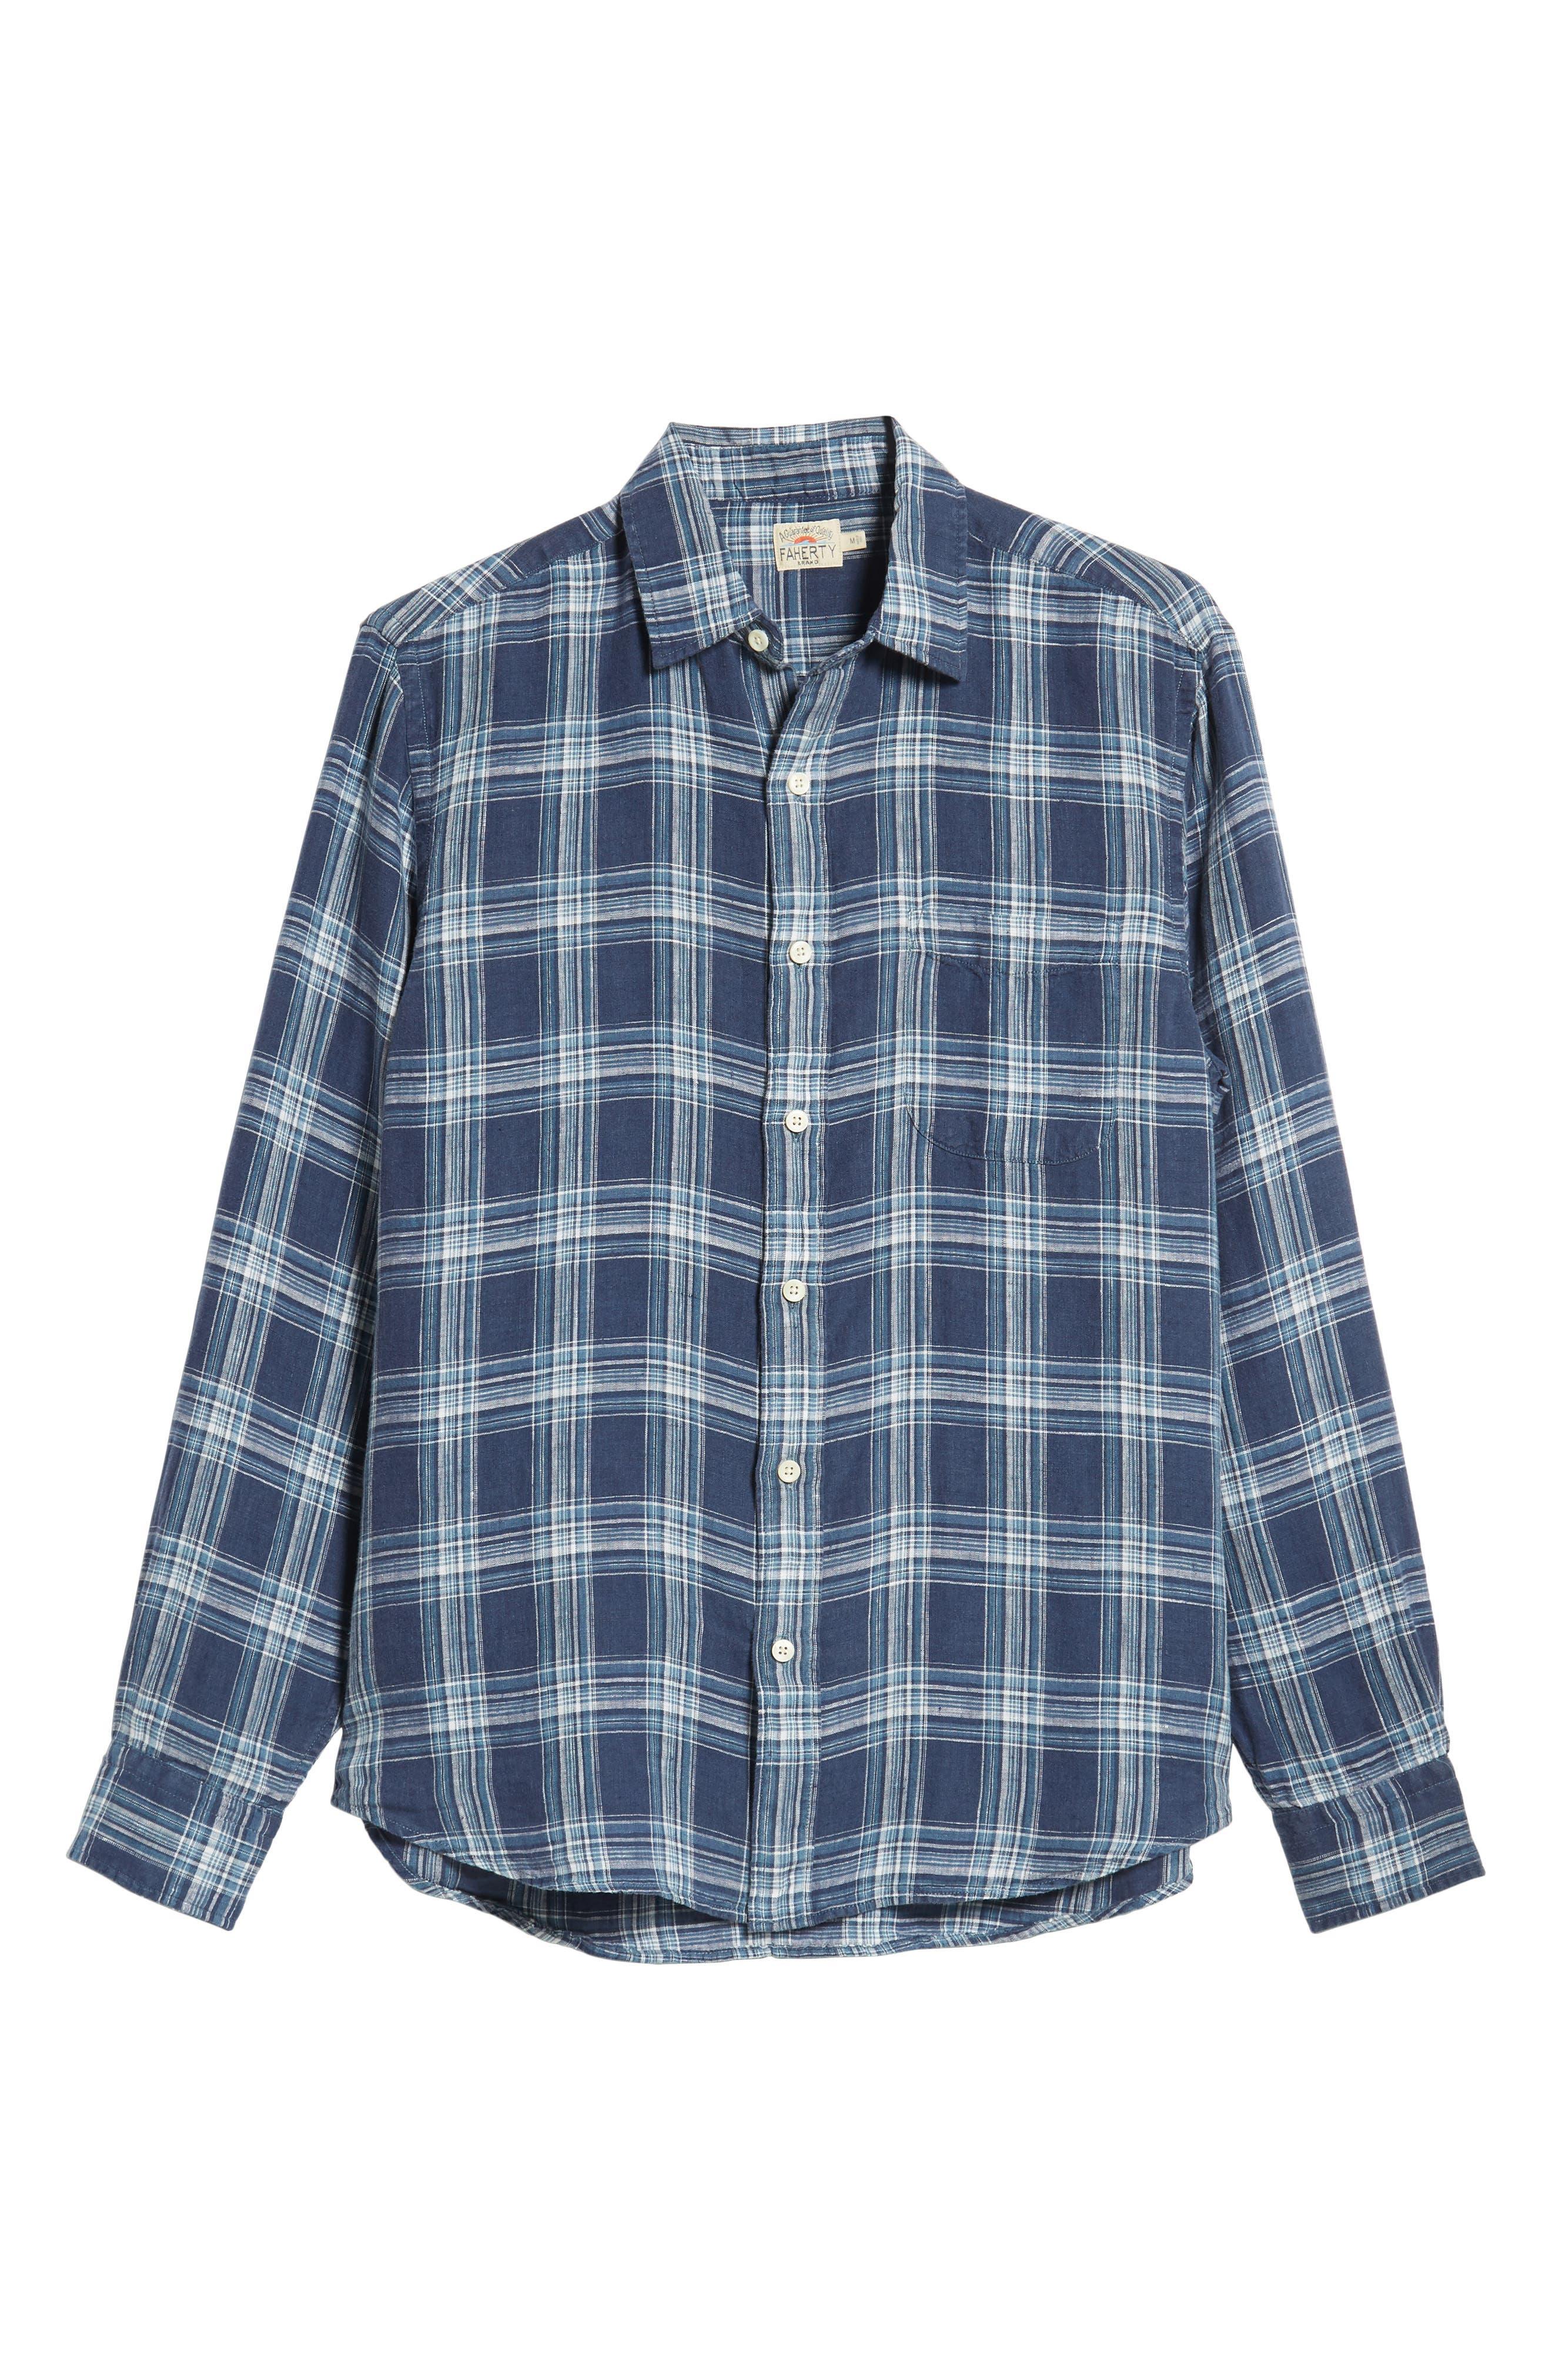 Ventura Check Linen Sport Shirt,                             Alternate thumbnail 5, color,                             400